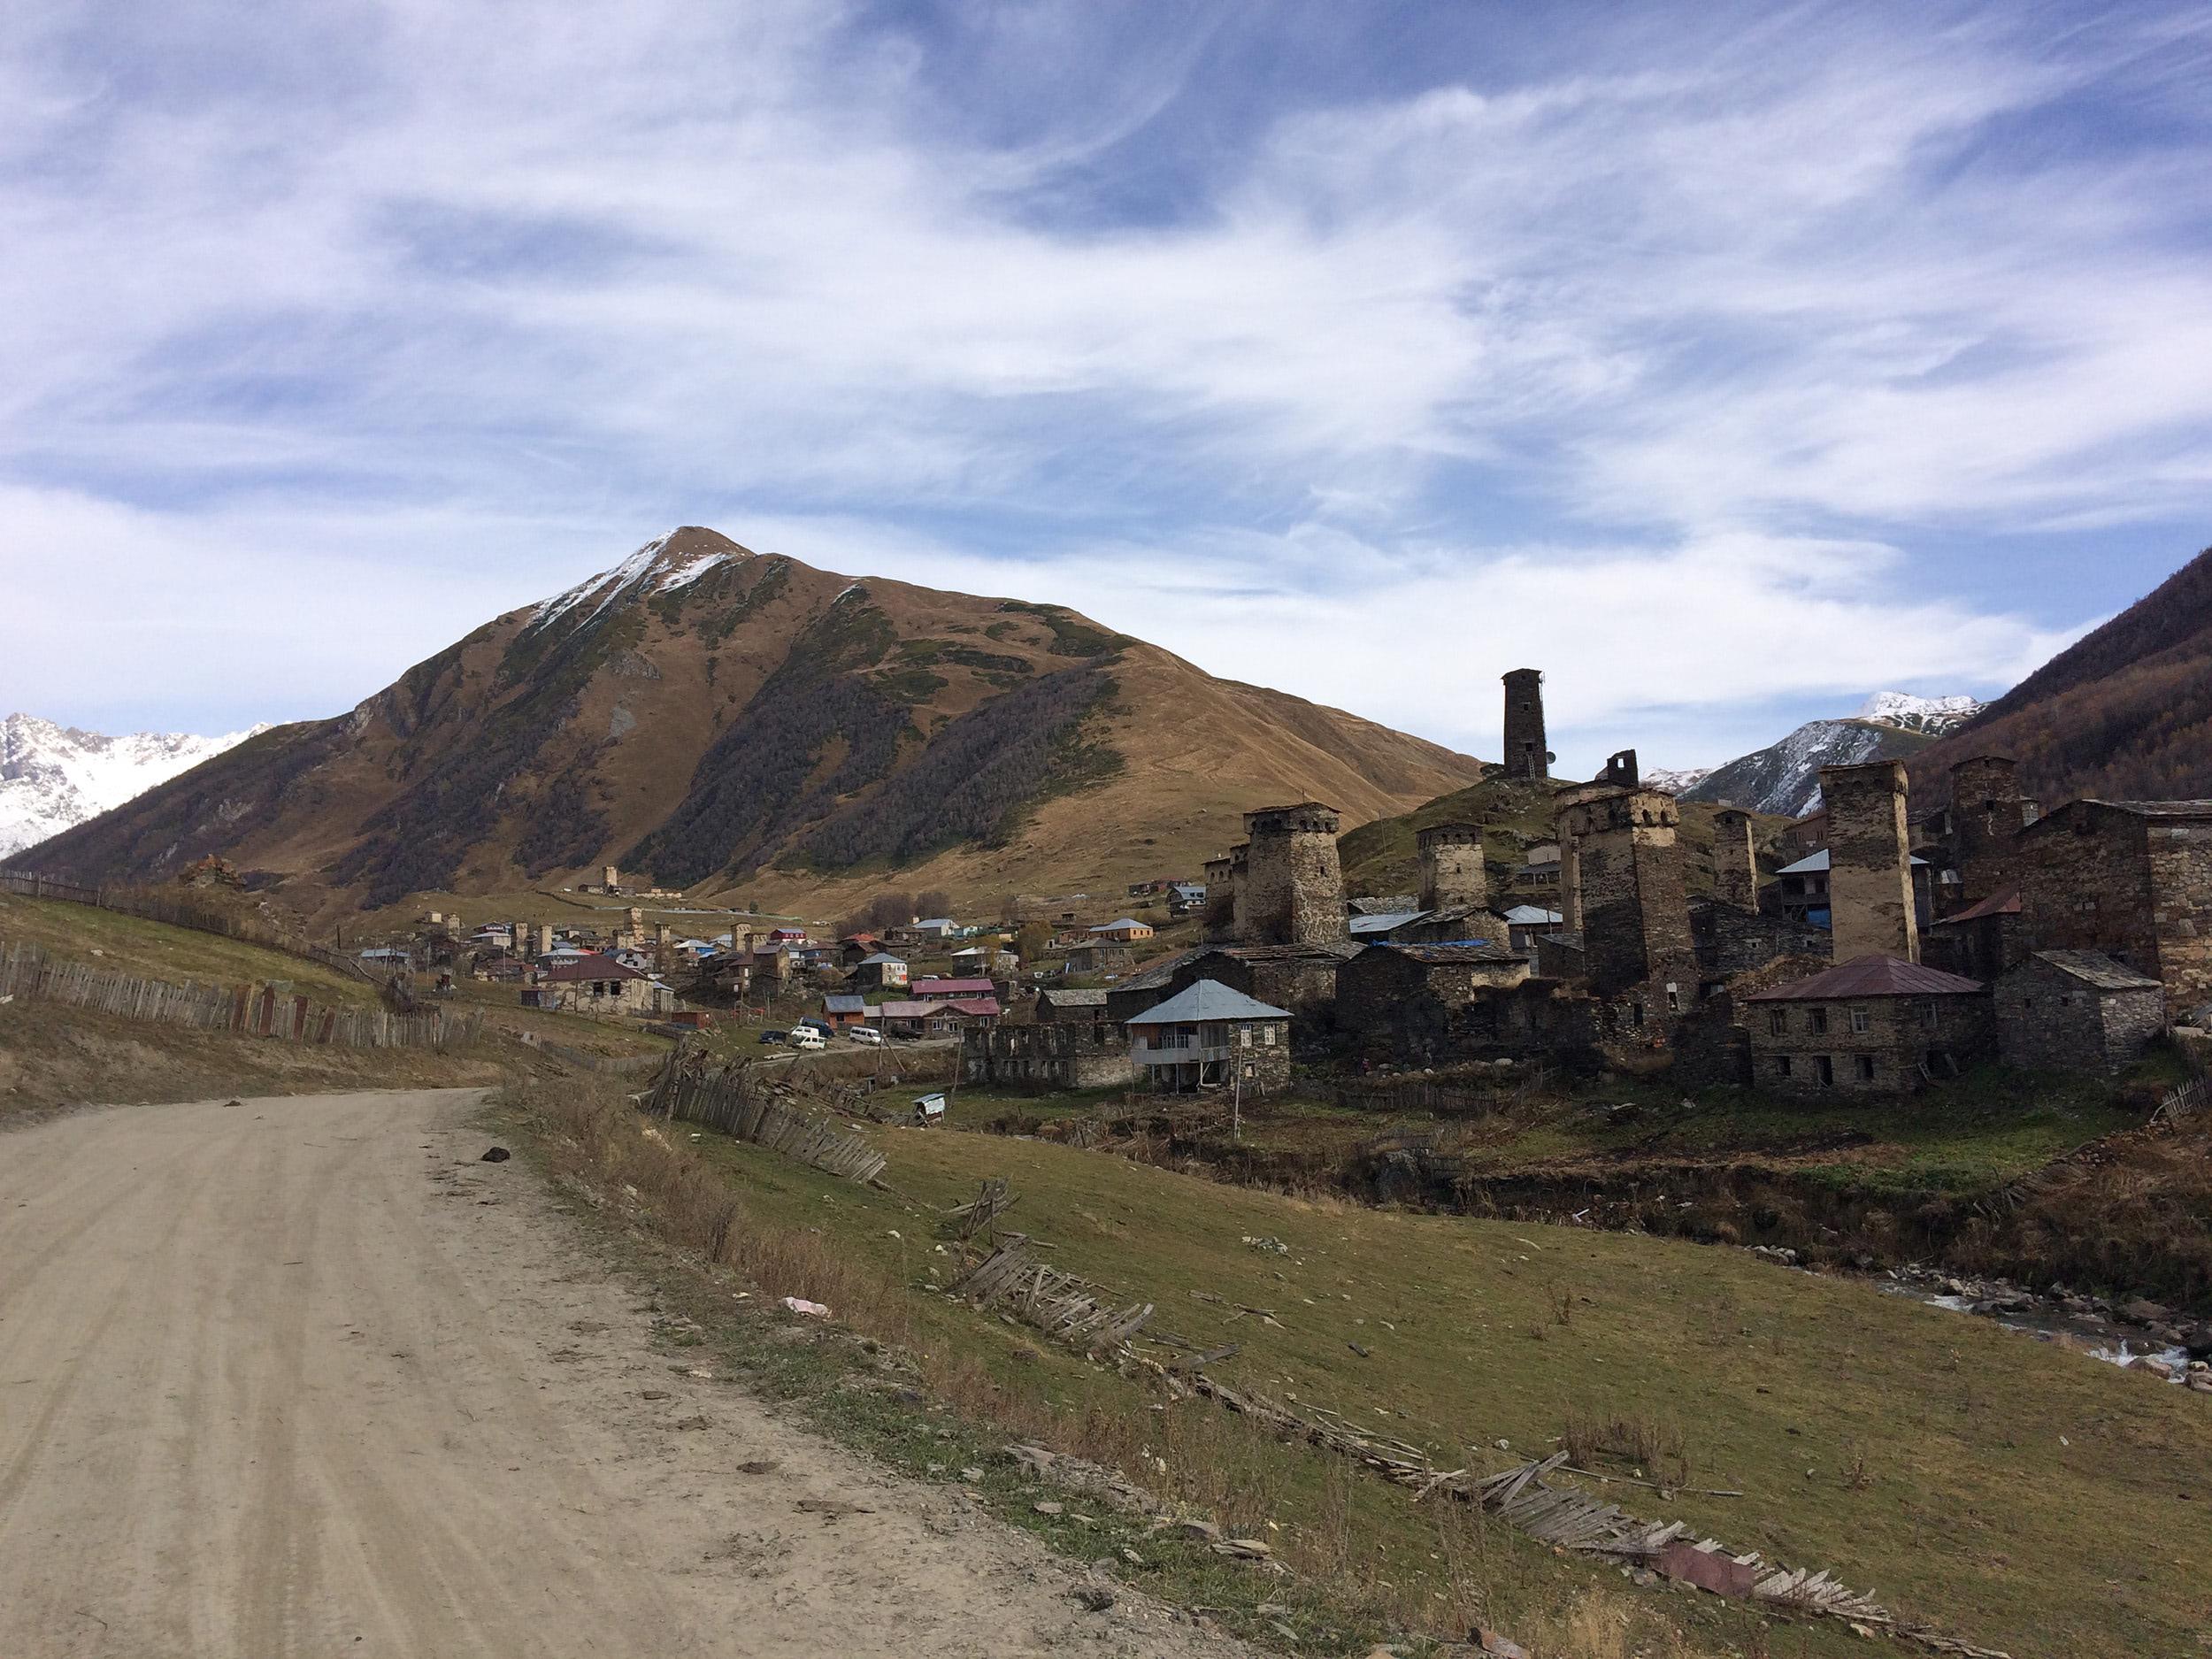 Svan village with typical towers. Photo by Gocha Kakulia.